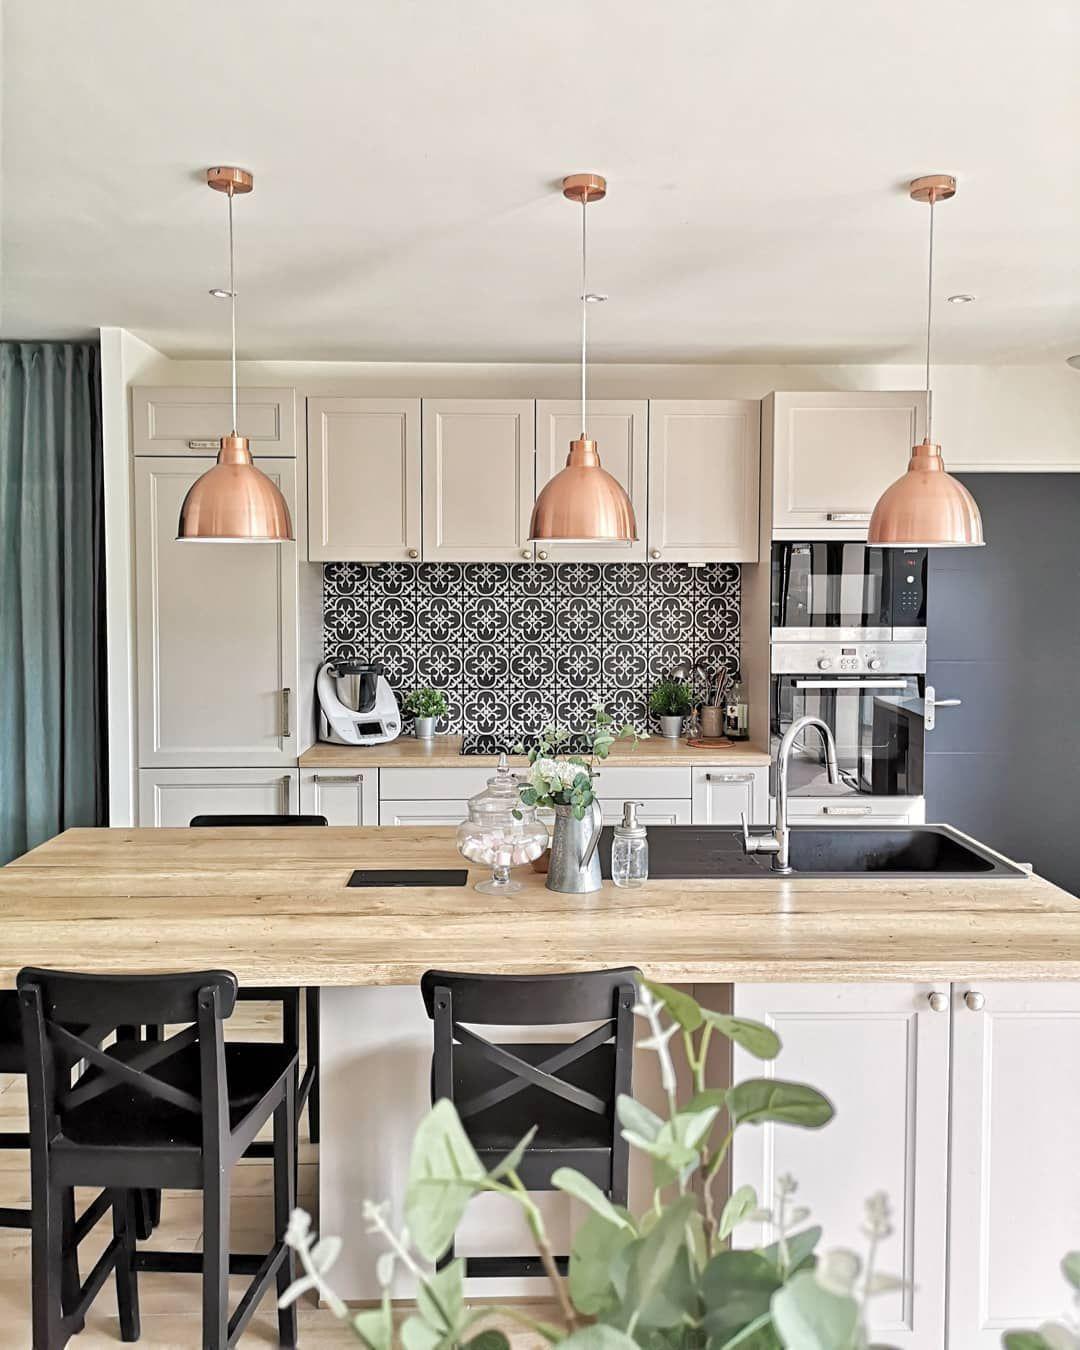 Cuisine Maison Cuisine De Ferme Home Home Decor Interior